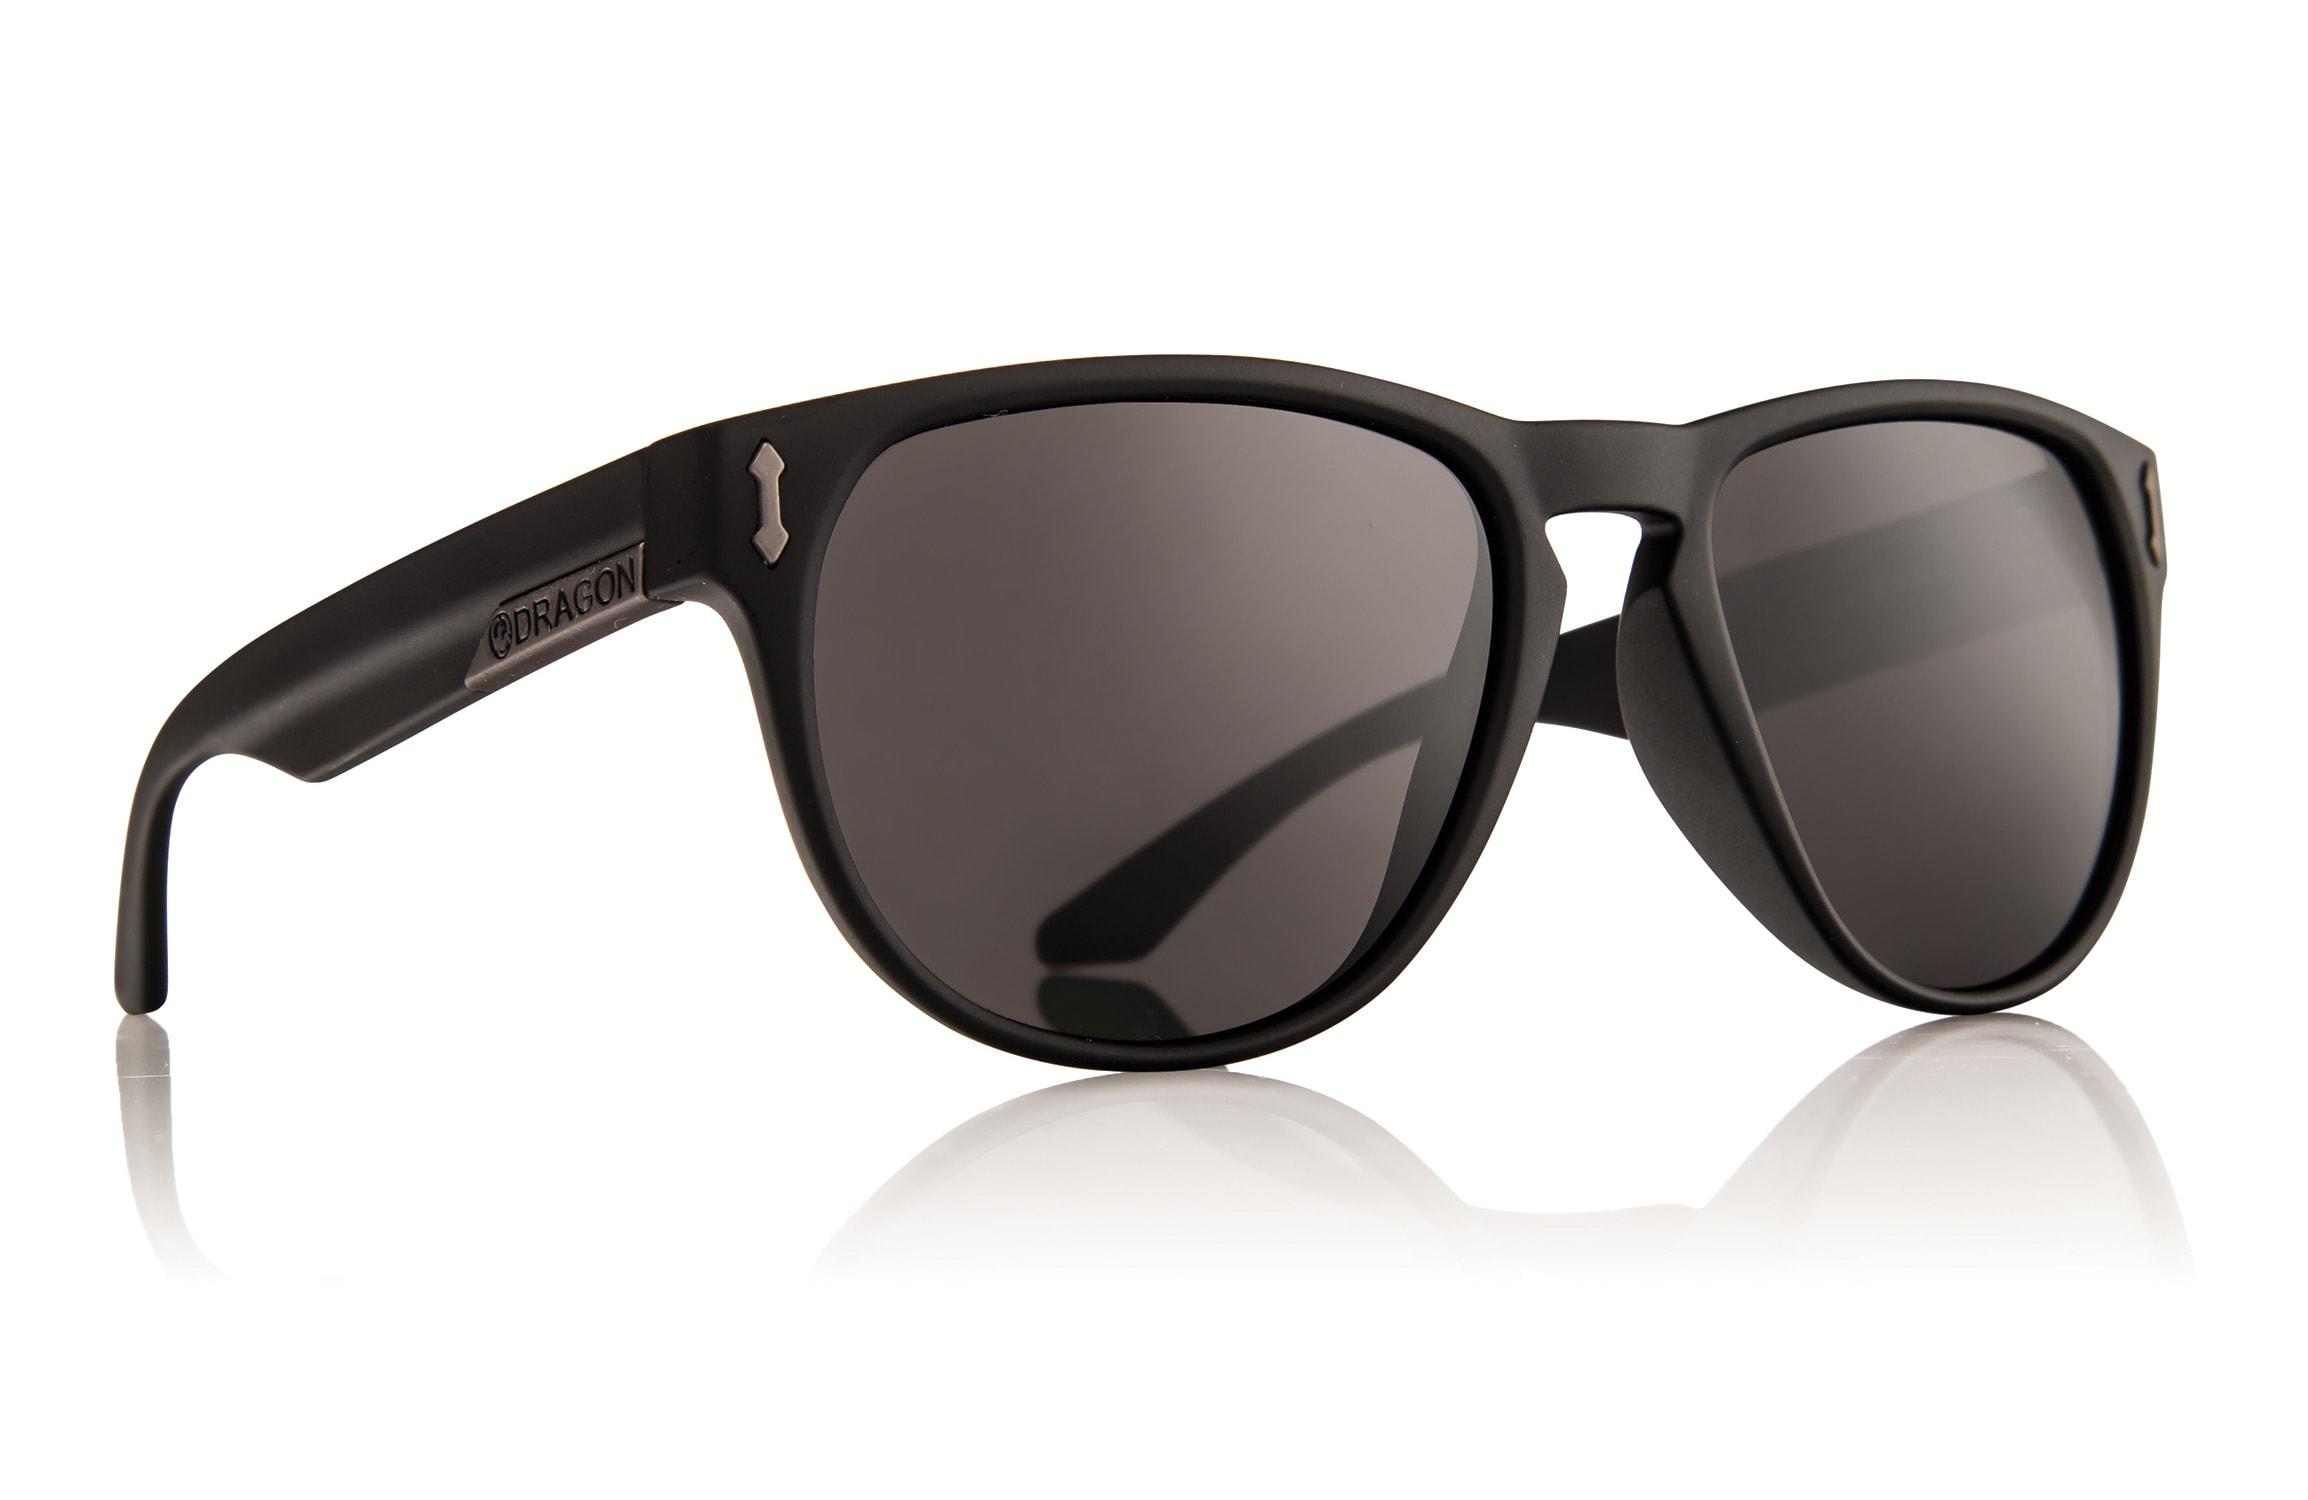 dragon sunglasses  dragon marquis sunglasses